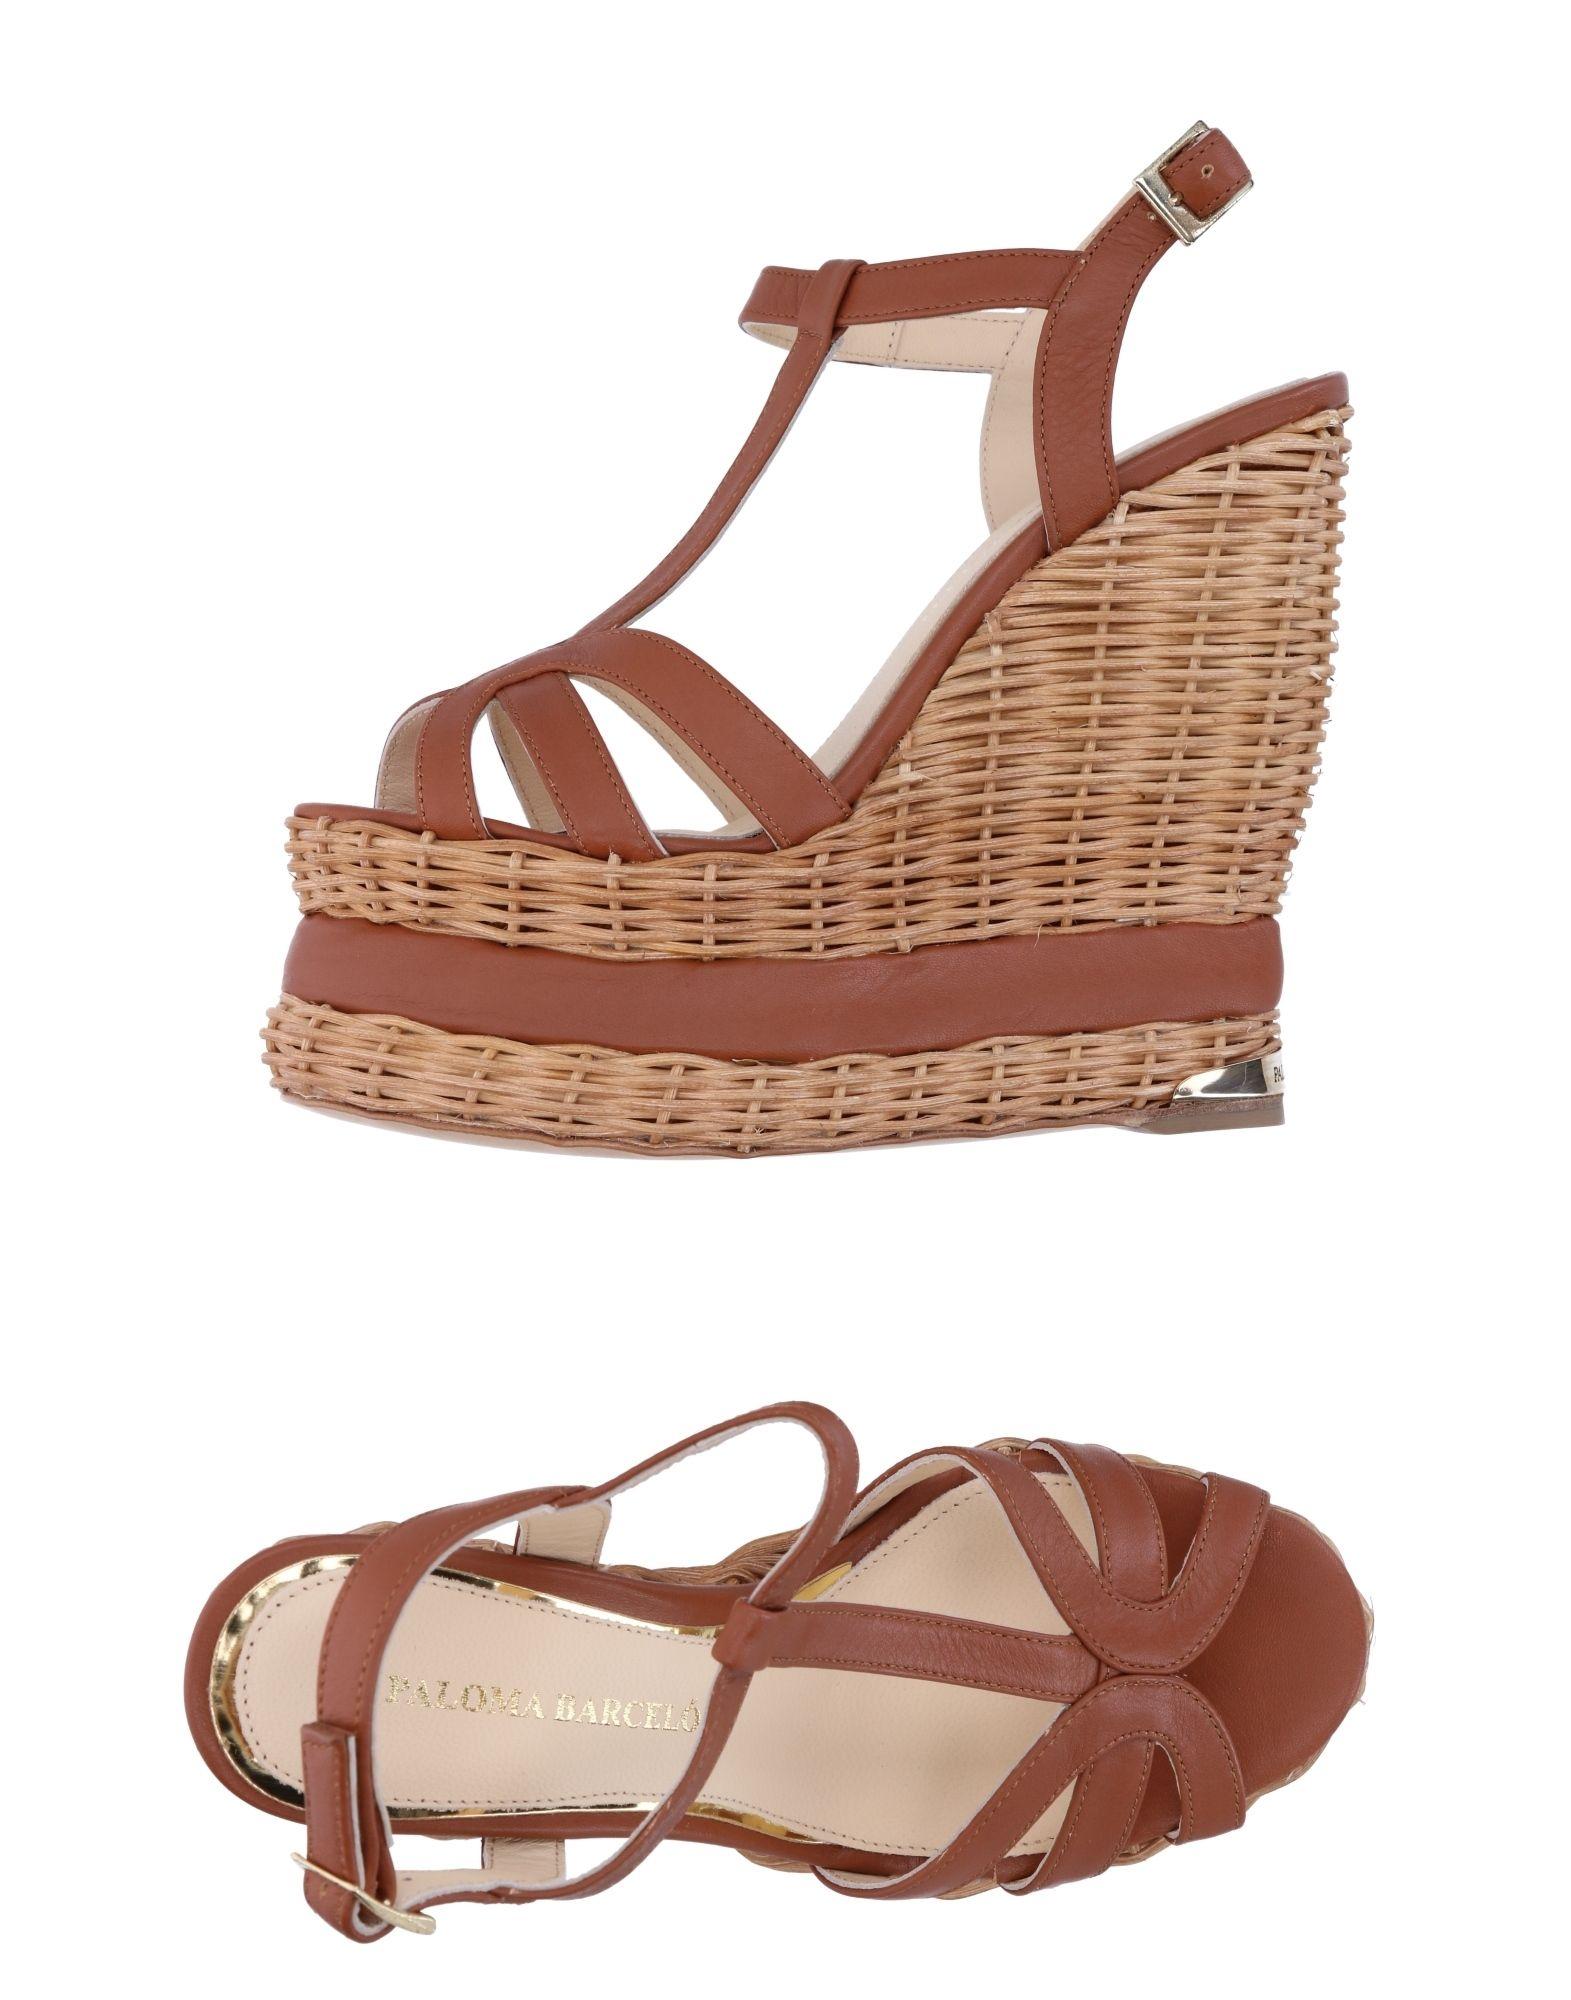 Stilvolle Sandalen billige Schuhe Paloma Barceló Sandalen Stilvolle Damen  11292762JB 1d5005